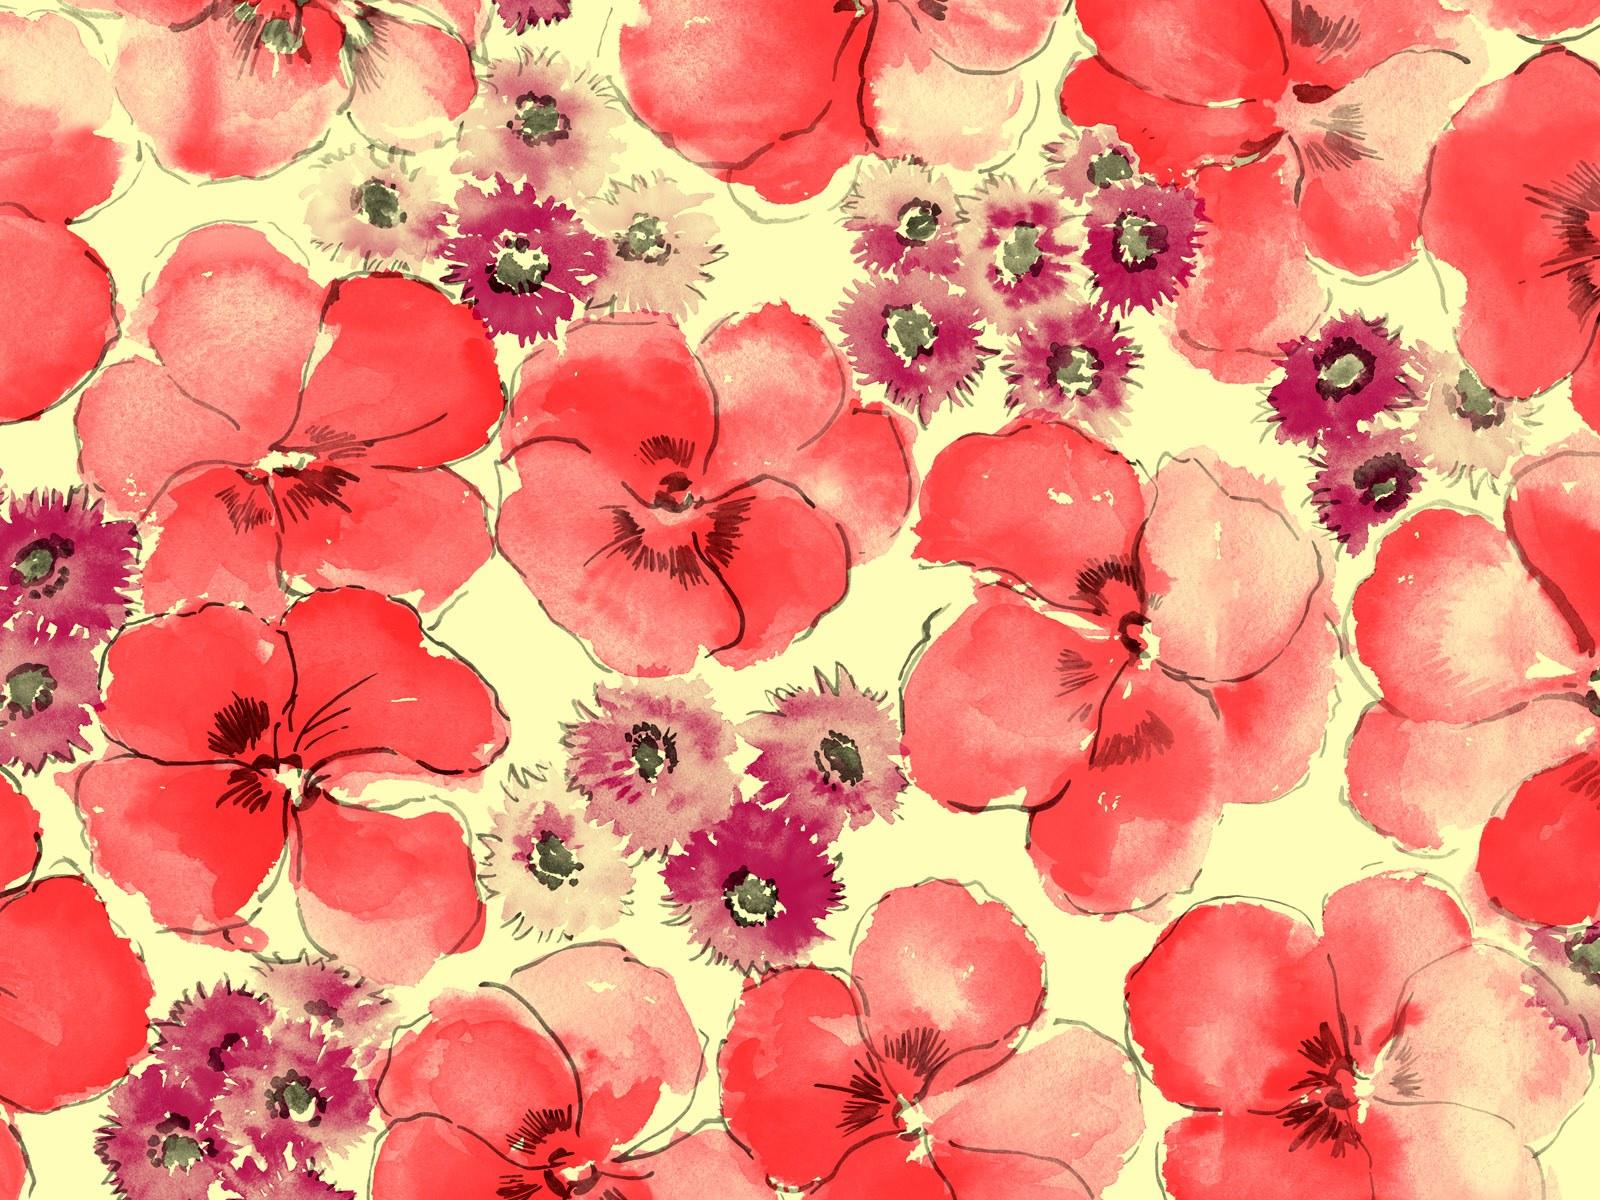 Floral illustrations Design - Floral Patterns - Flower Paintings - Flower Backgrounds 1600*1200 Wallpaper